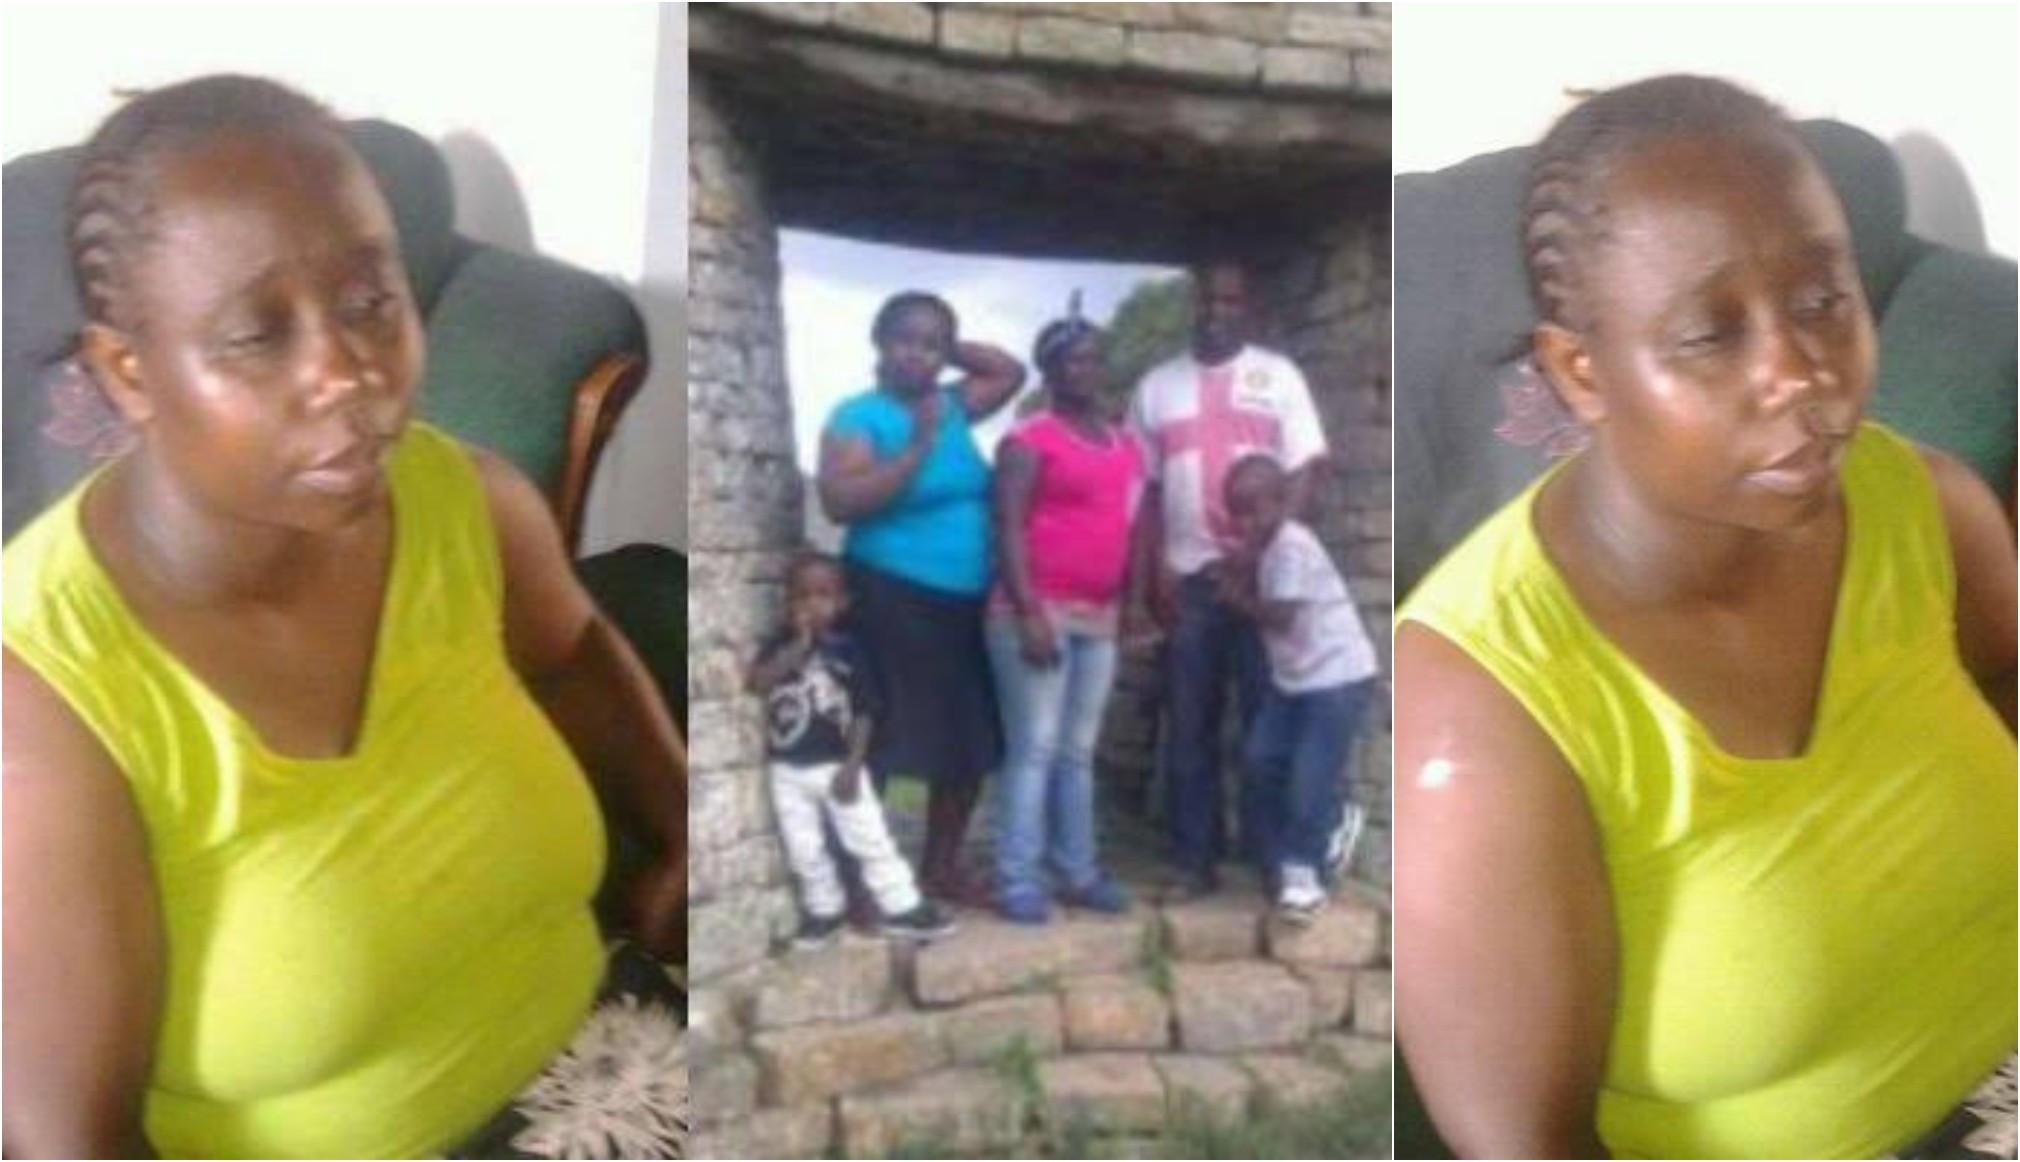 Woman sells her husband for N6000 (Ksh 1700) to buy clothes lindaikejisblog